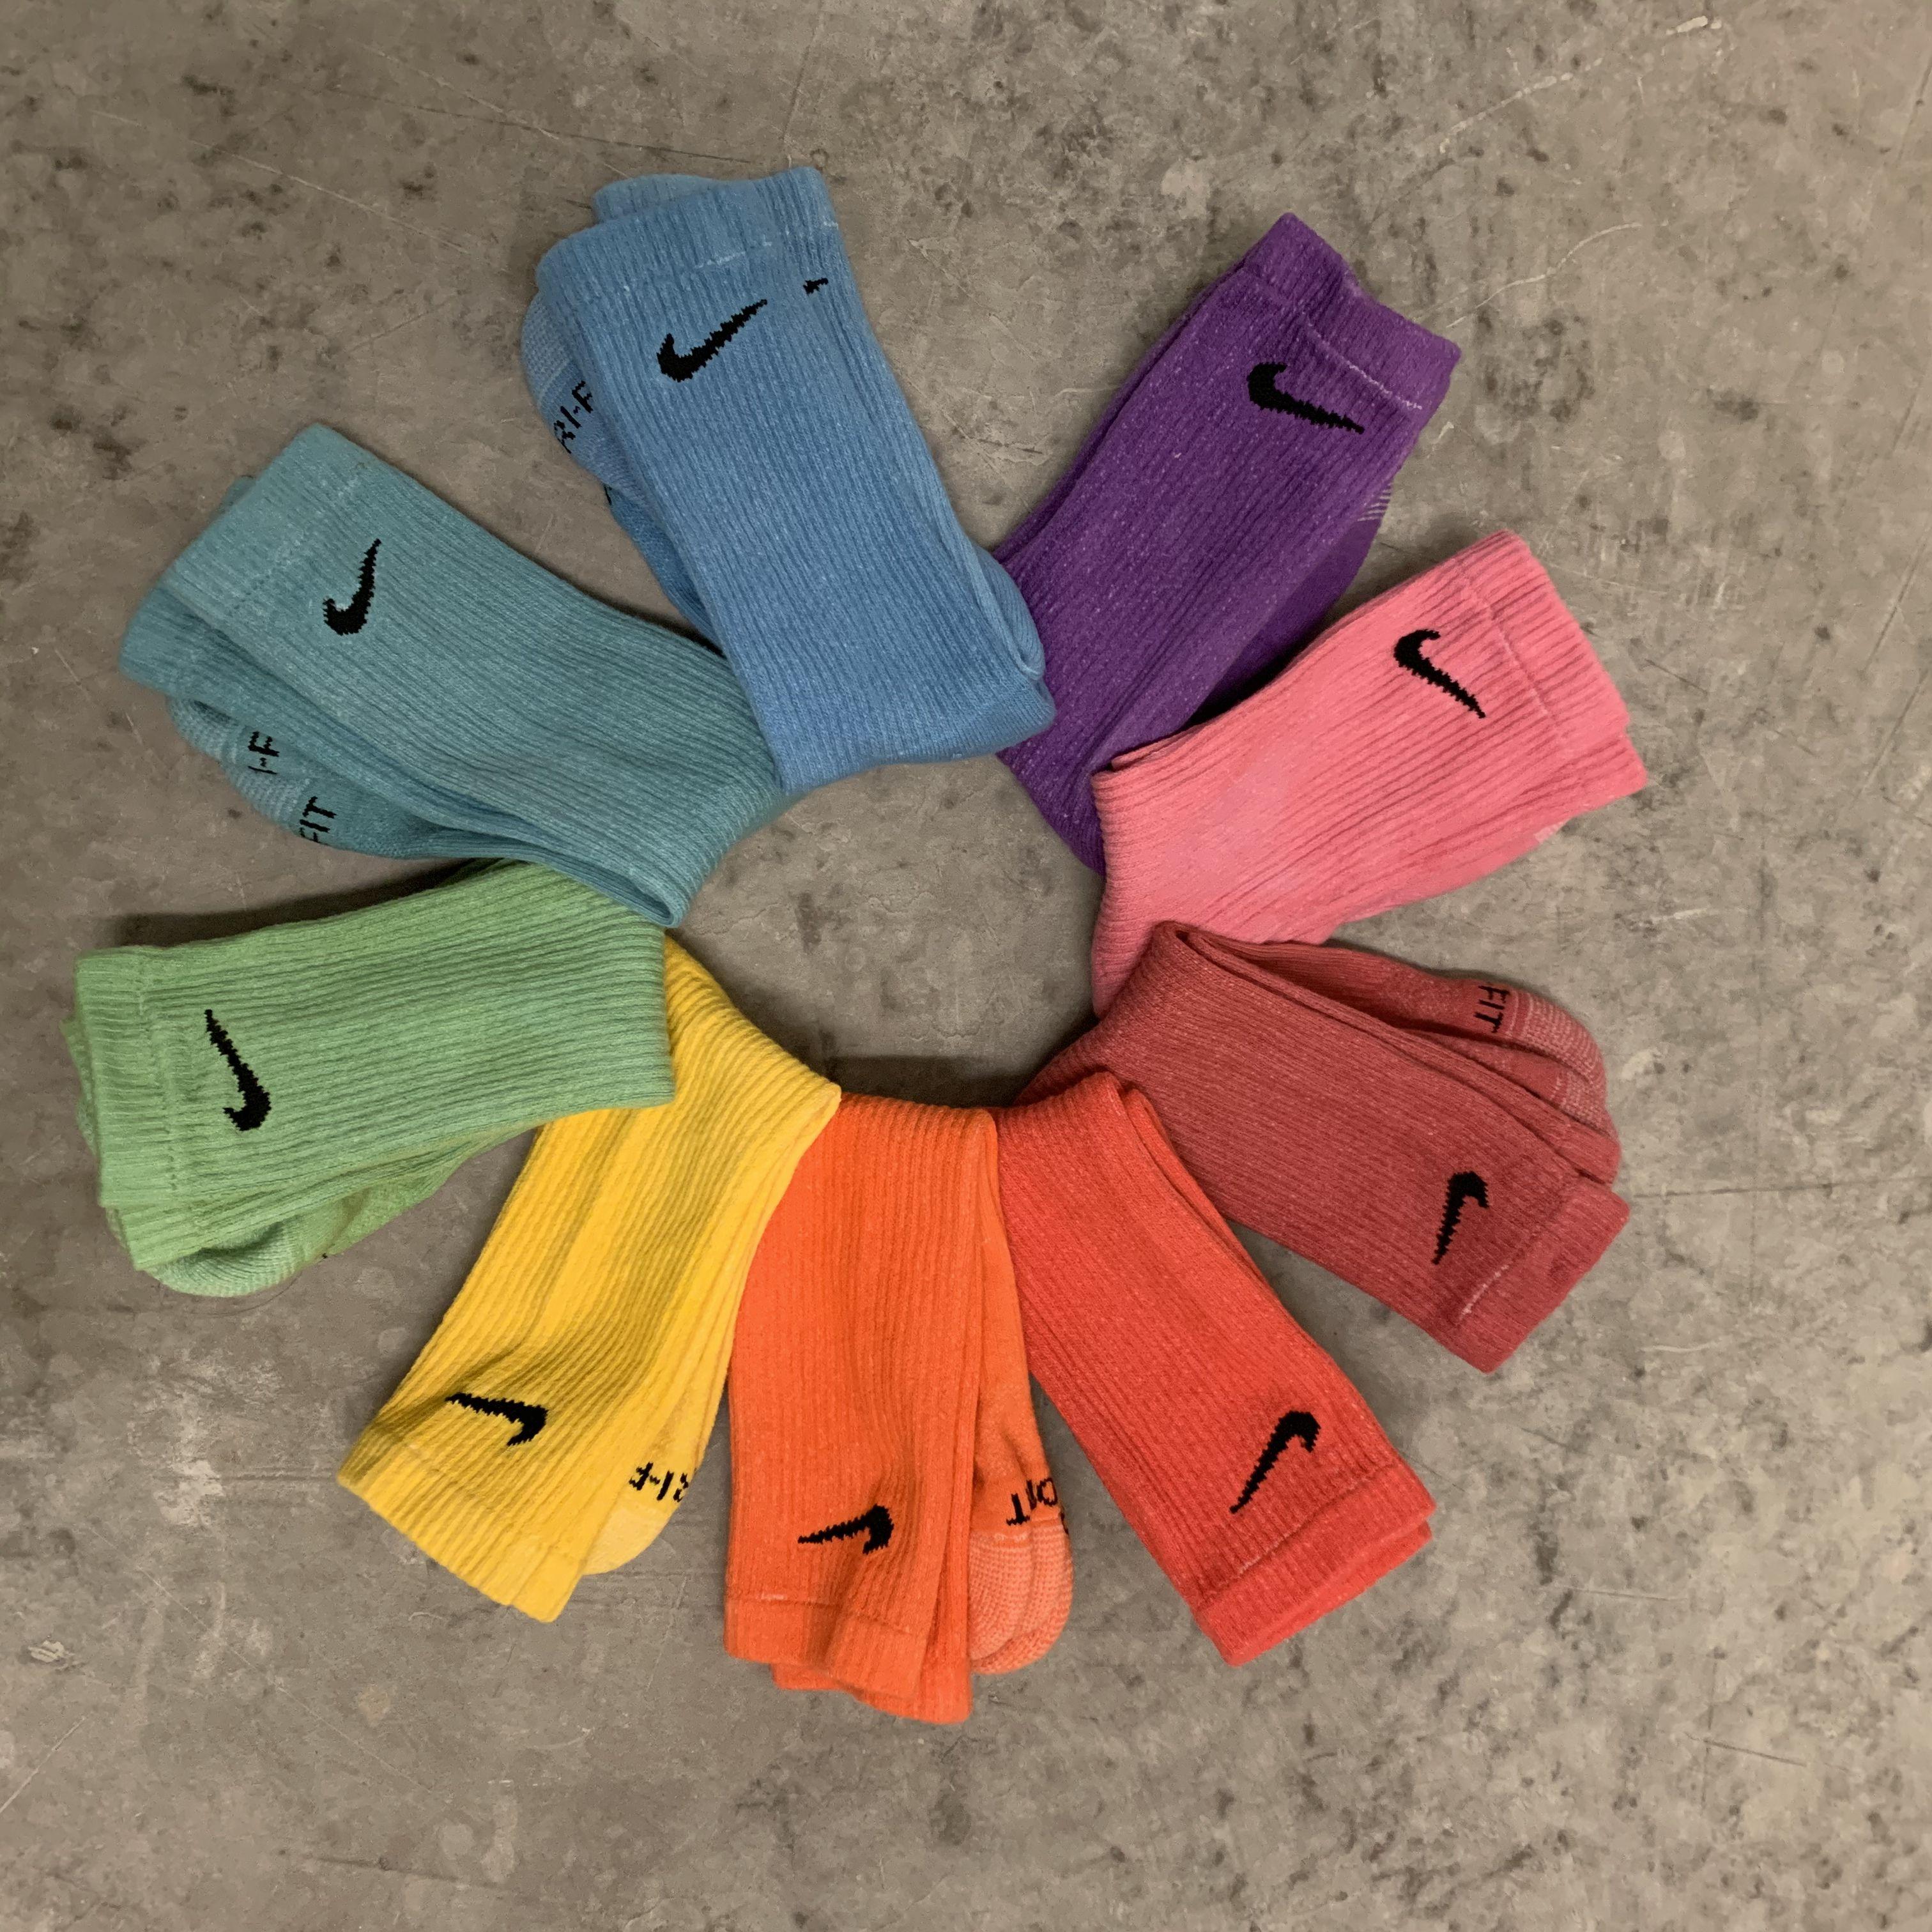 Tiempo de día Invertir Mejor  Nike one color wonder socks 3-Pack made to order dyed nike   Etsy   Sock  outfits, Tie dye socks, Stylish socks